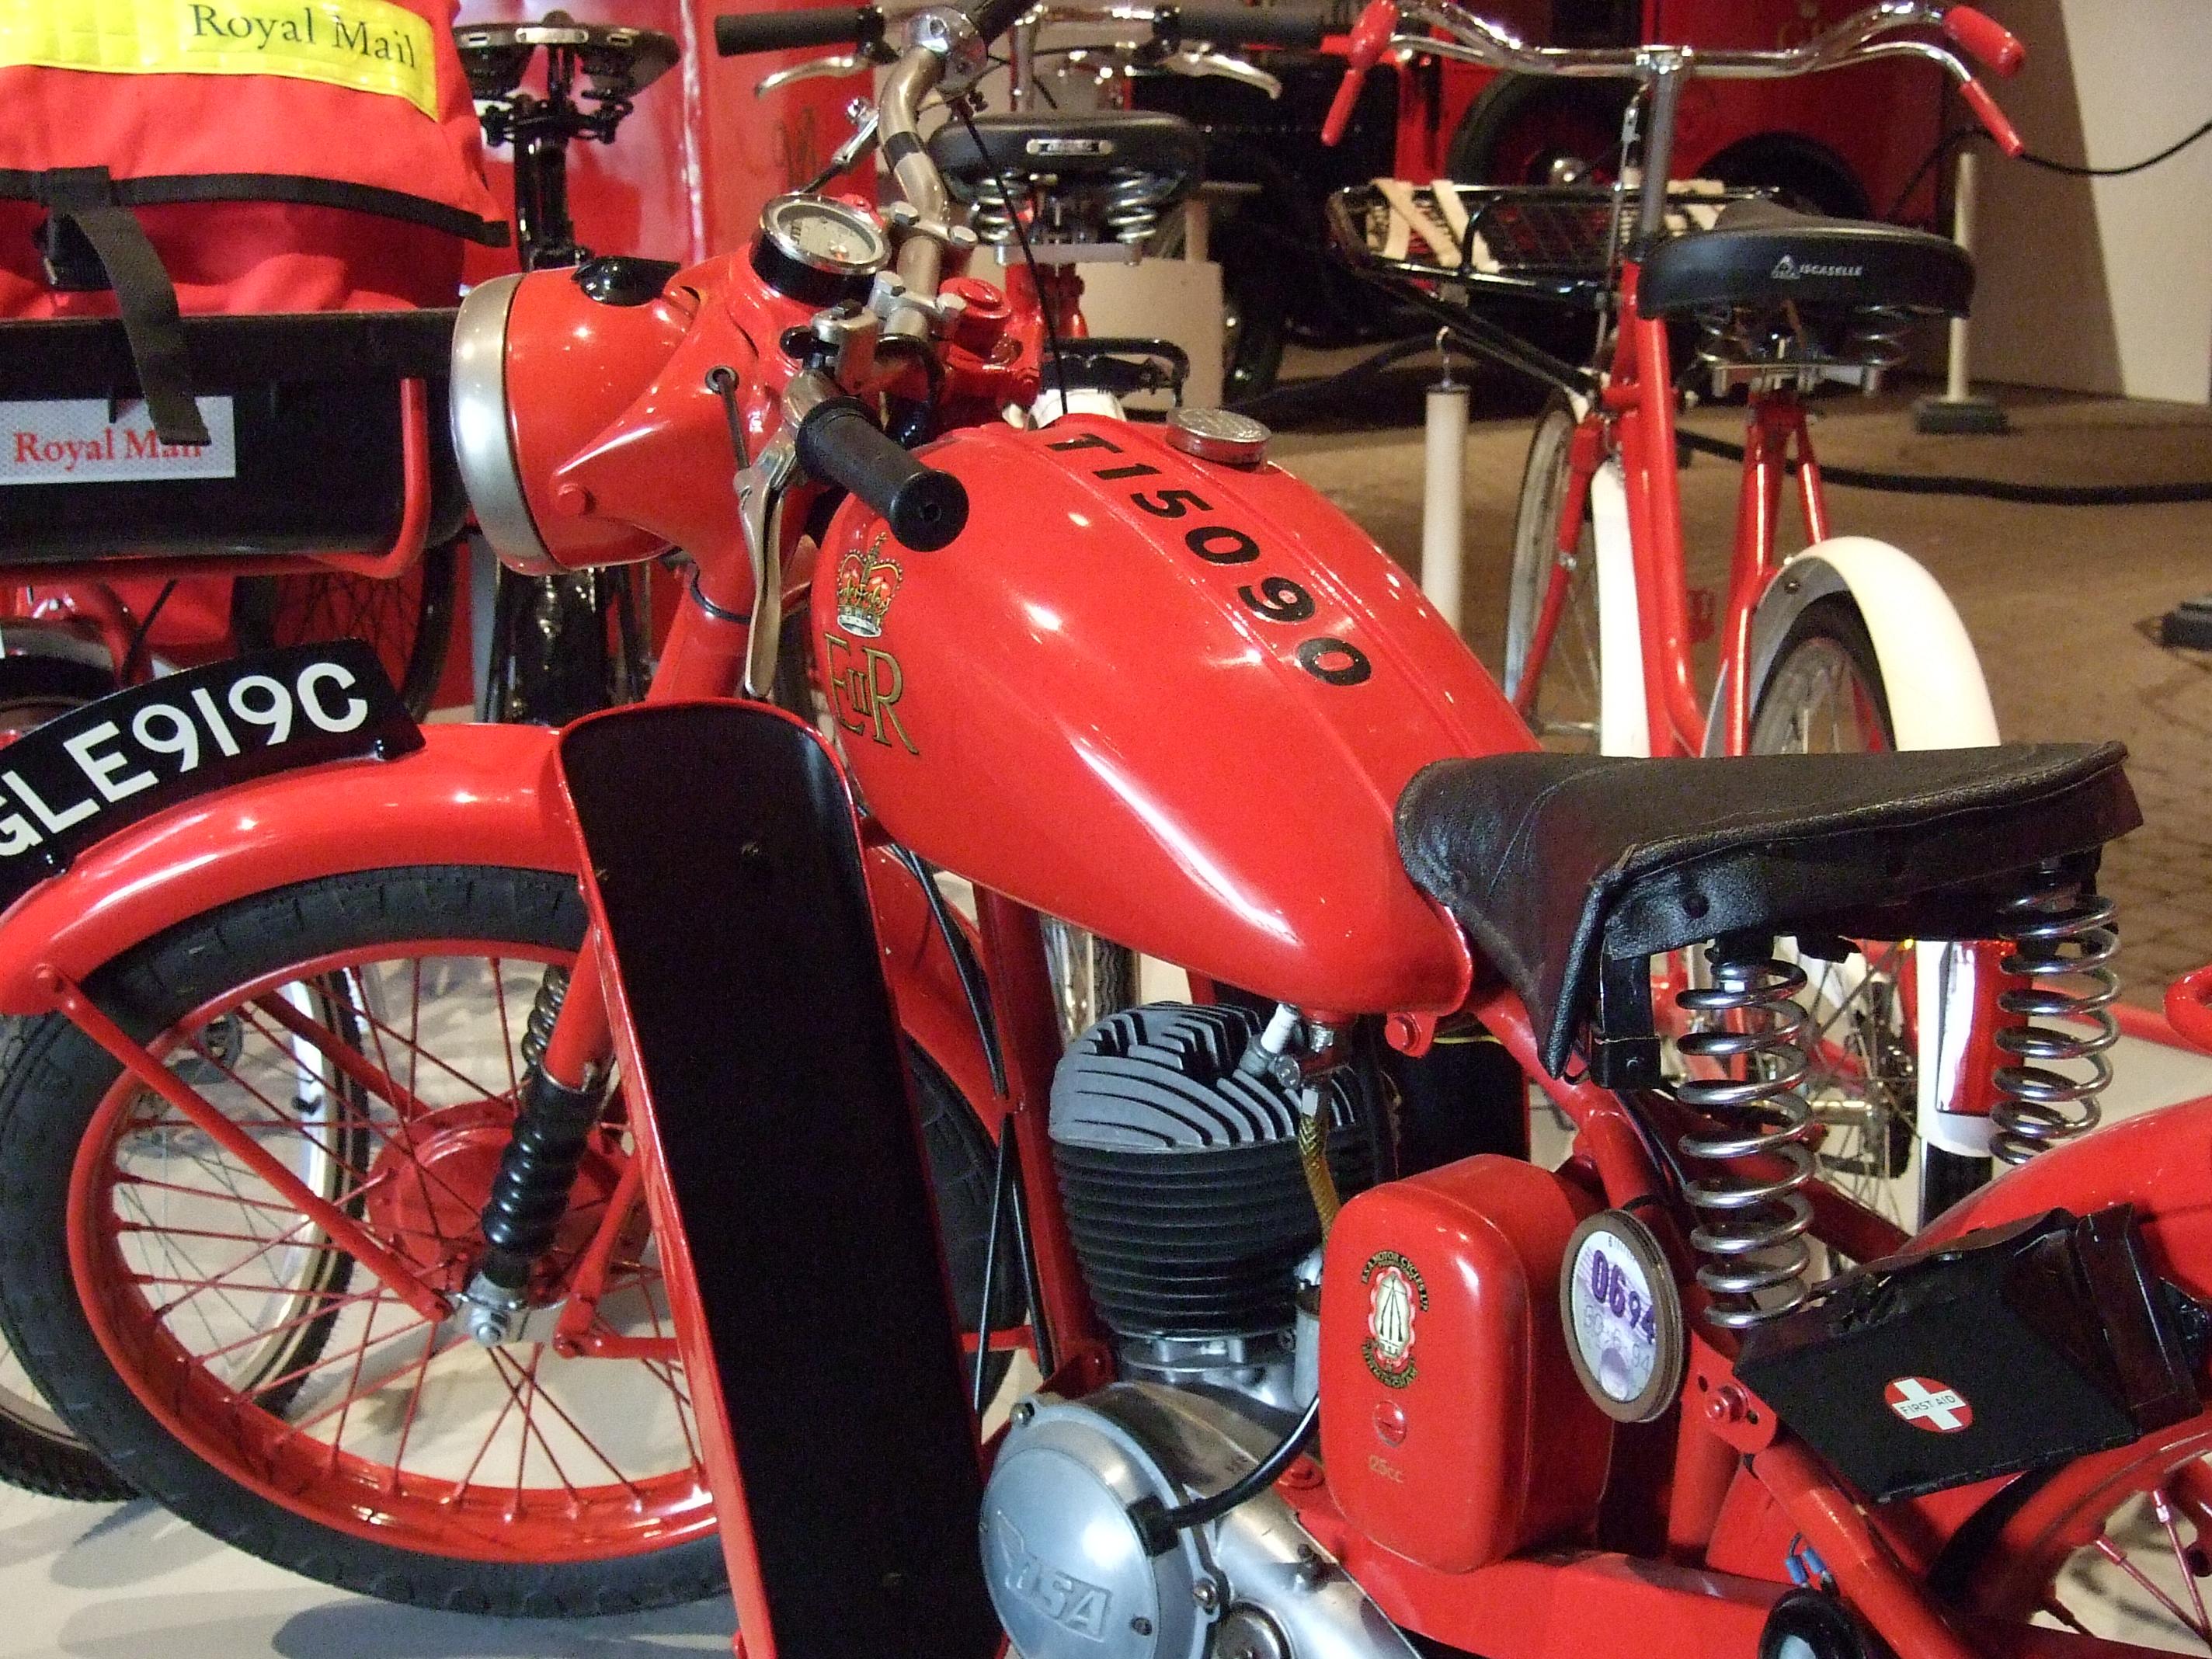 FileBSA Bantam Motorcycle 1965 1